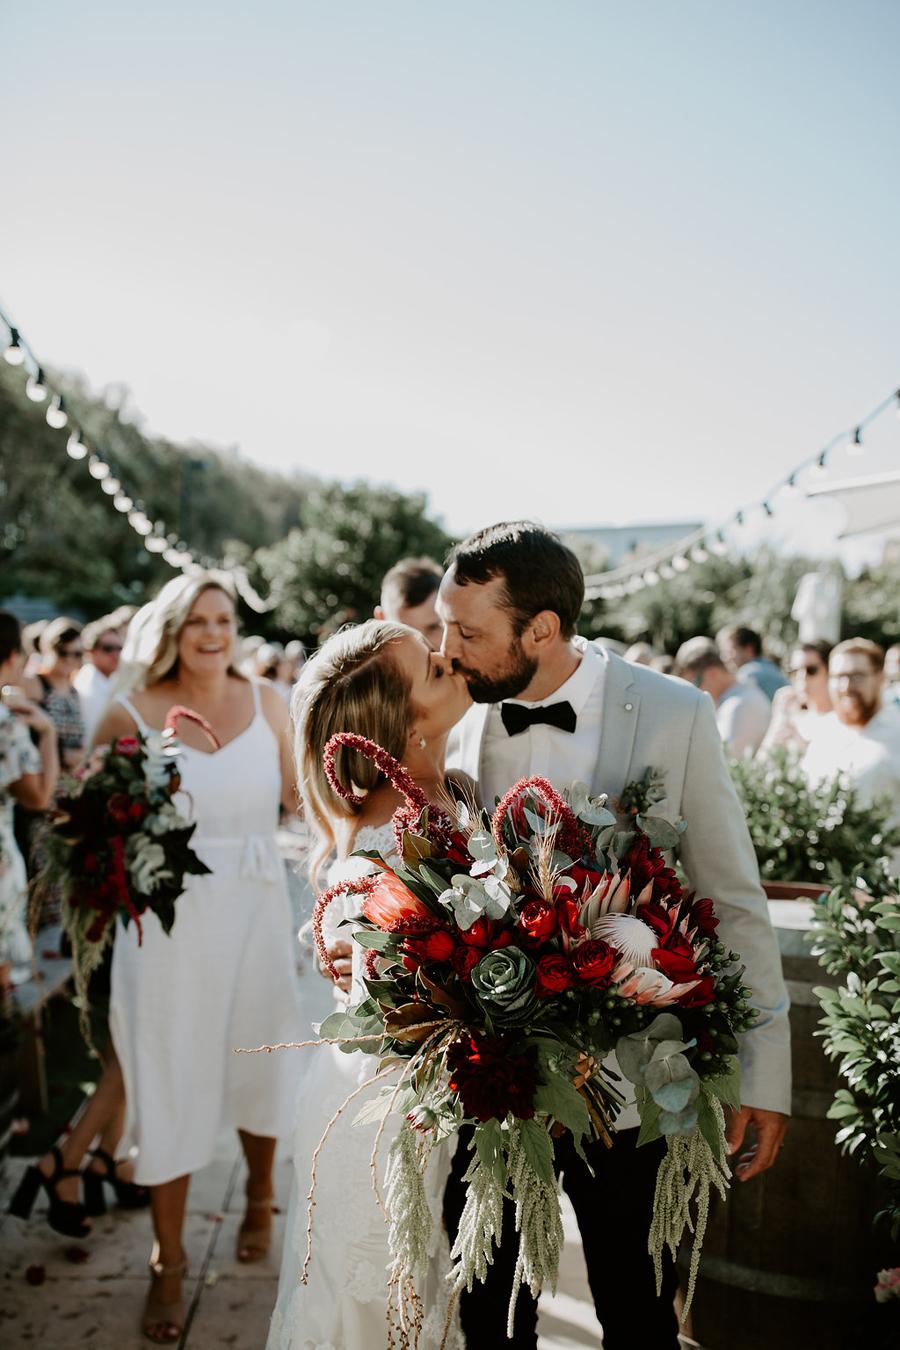 osteria-casuarina-wedding-venue-tweed-coast-weddings-coastal-garden-reception-real-wedding022.jpg